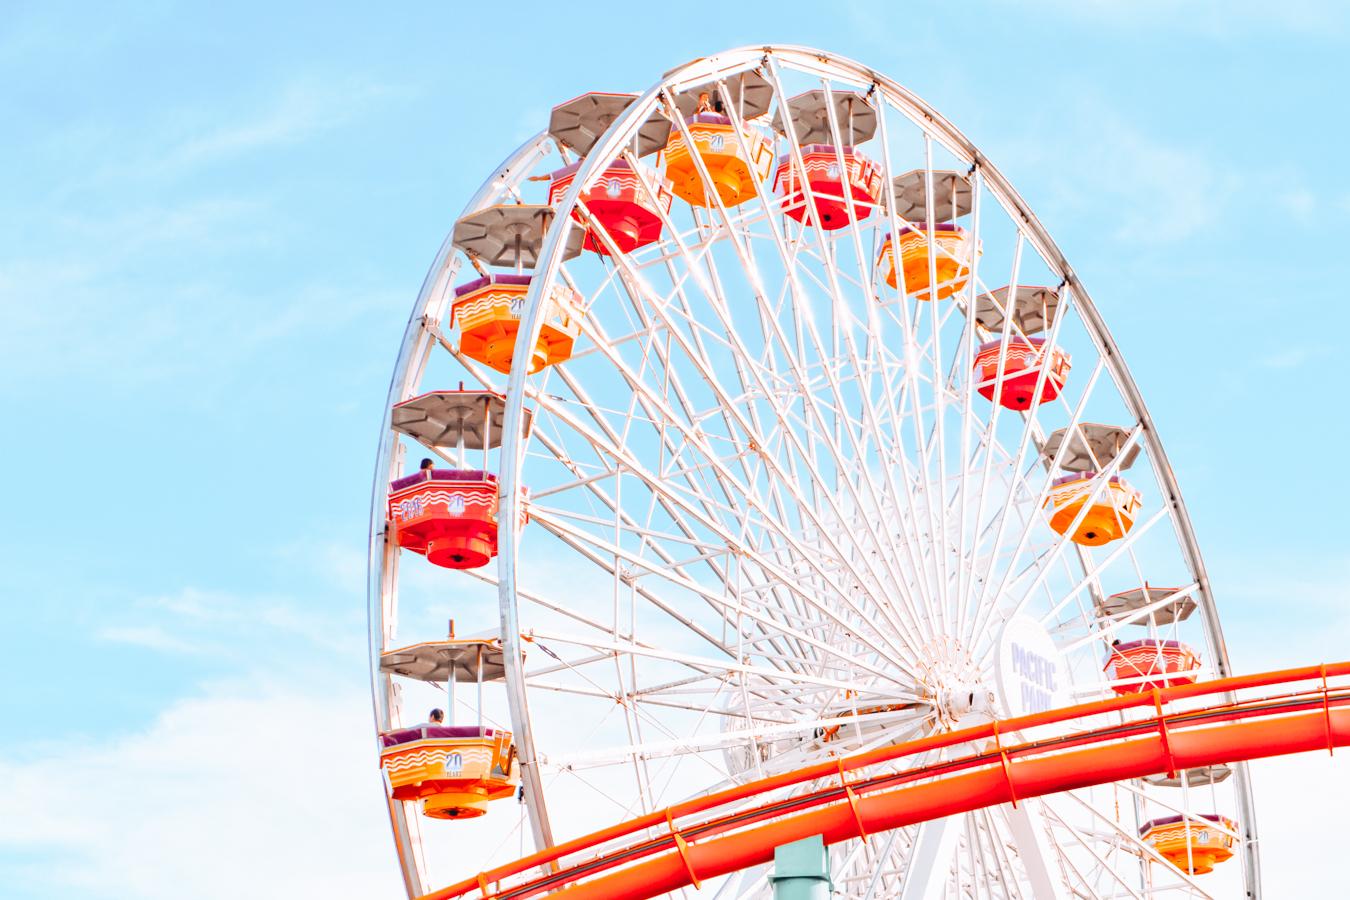 Ferris Wheel in Los Angeles